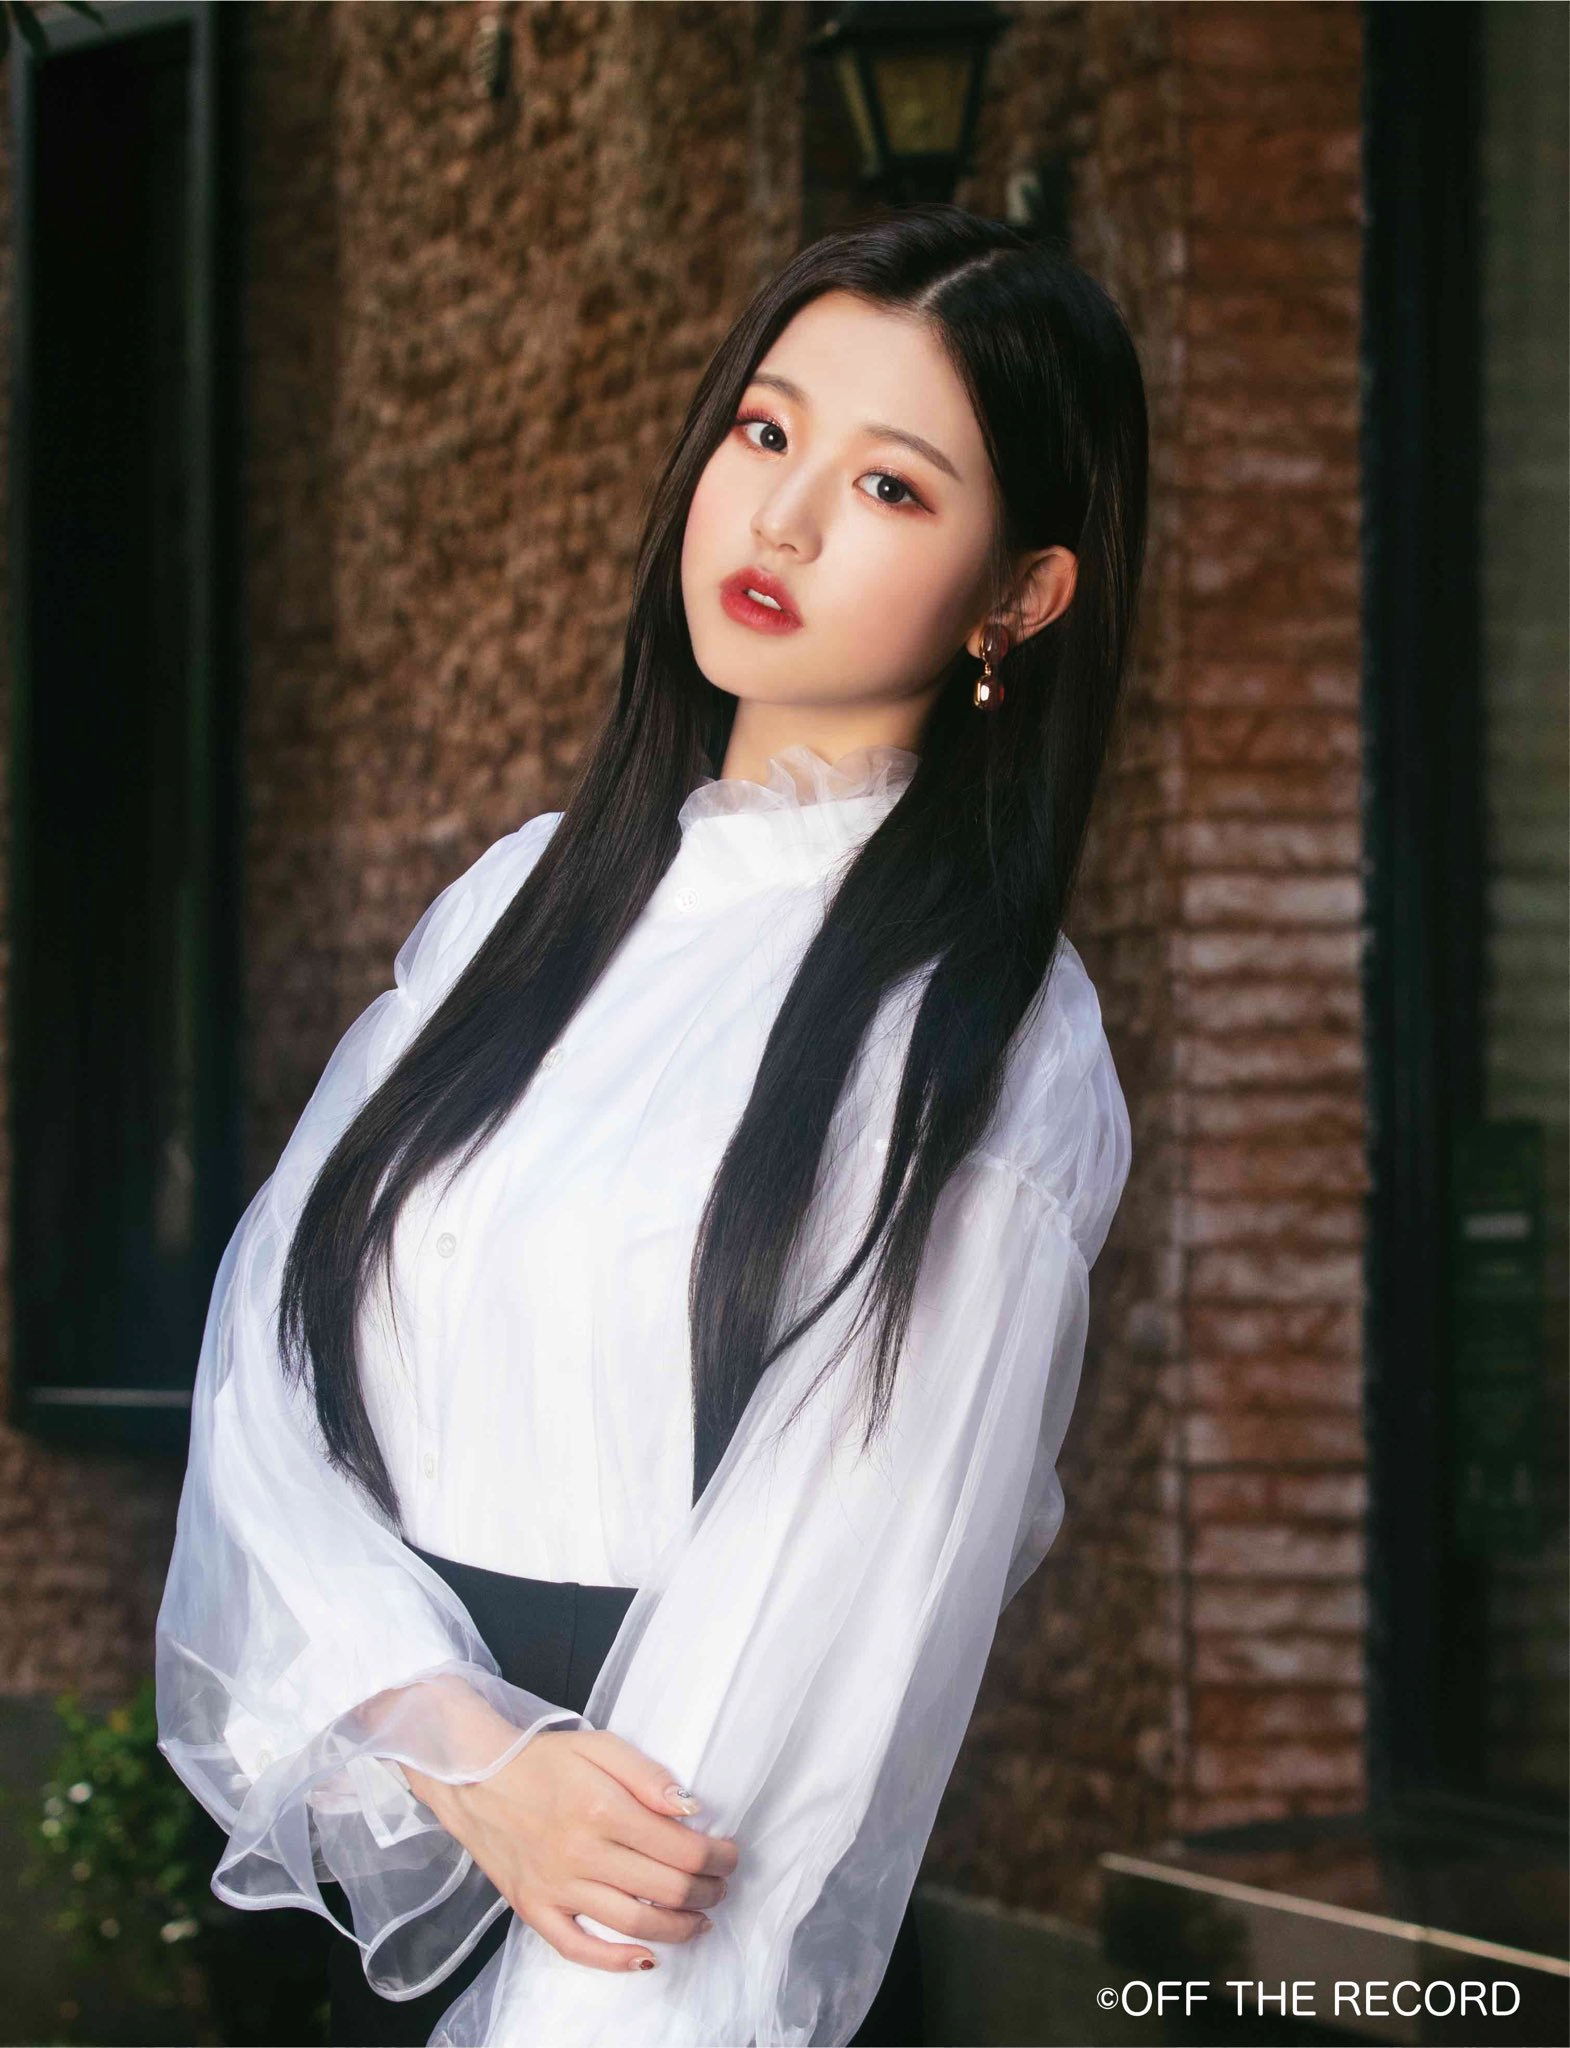 Jang Won Young | Kpop Wiki | FANDOM powered by Wikia